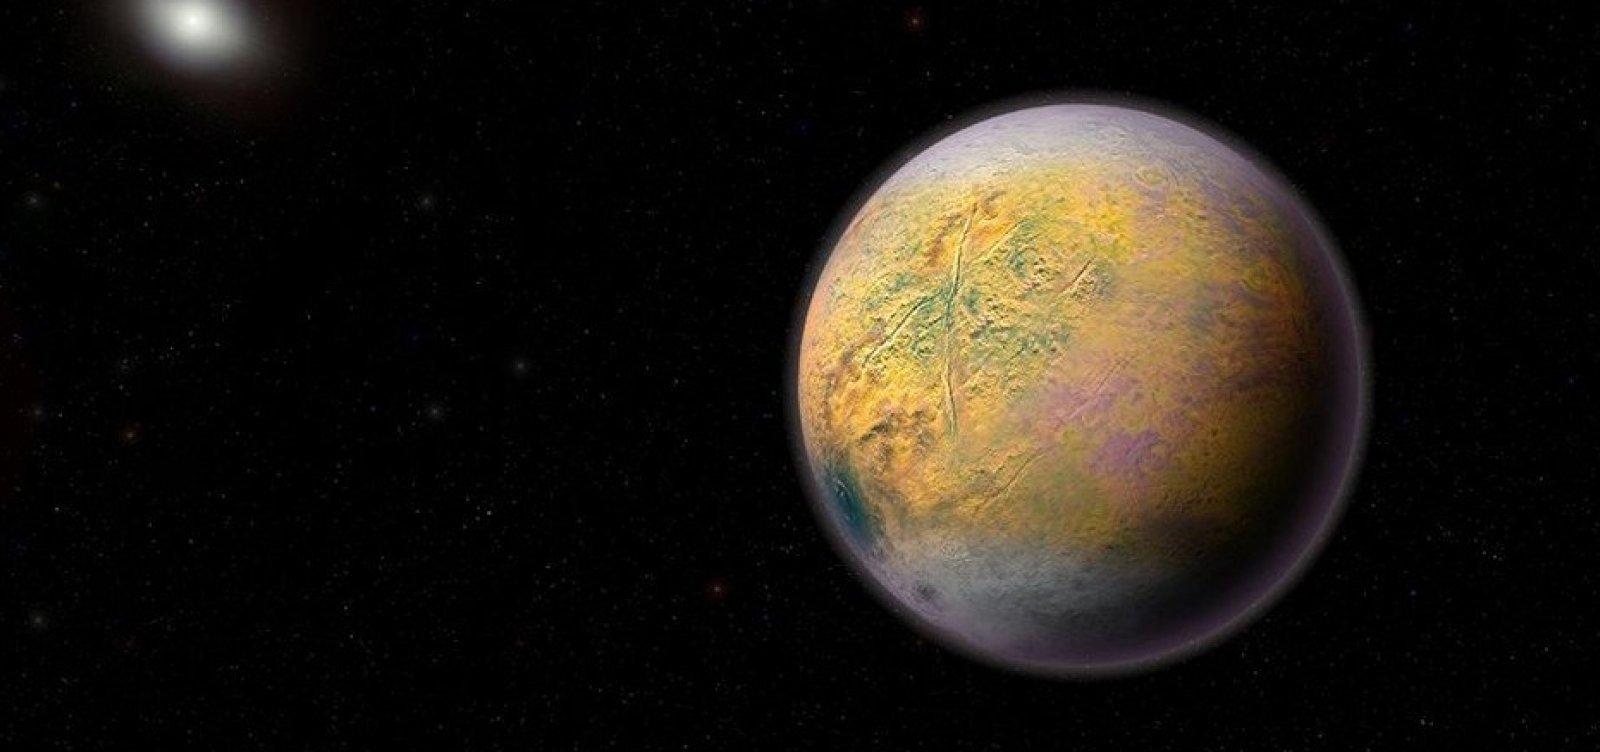 [Objeto descoberto nos confins do Sistema Solar aponta para existência de nono planeta]